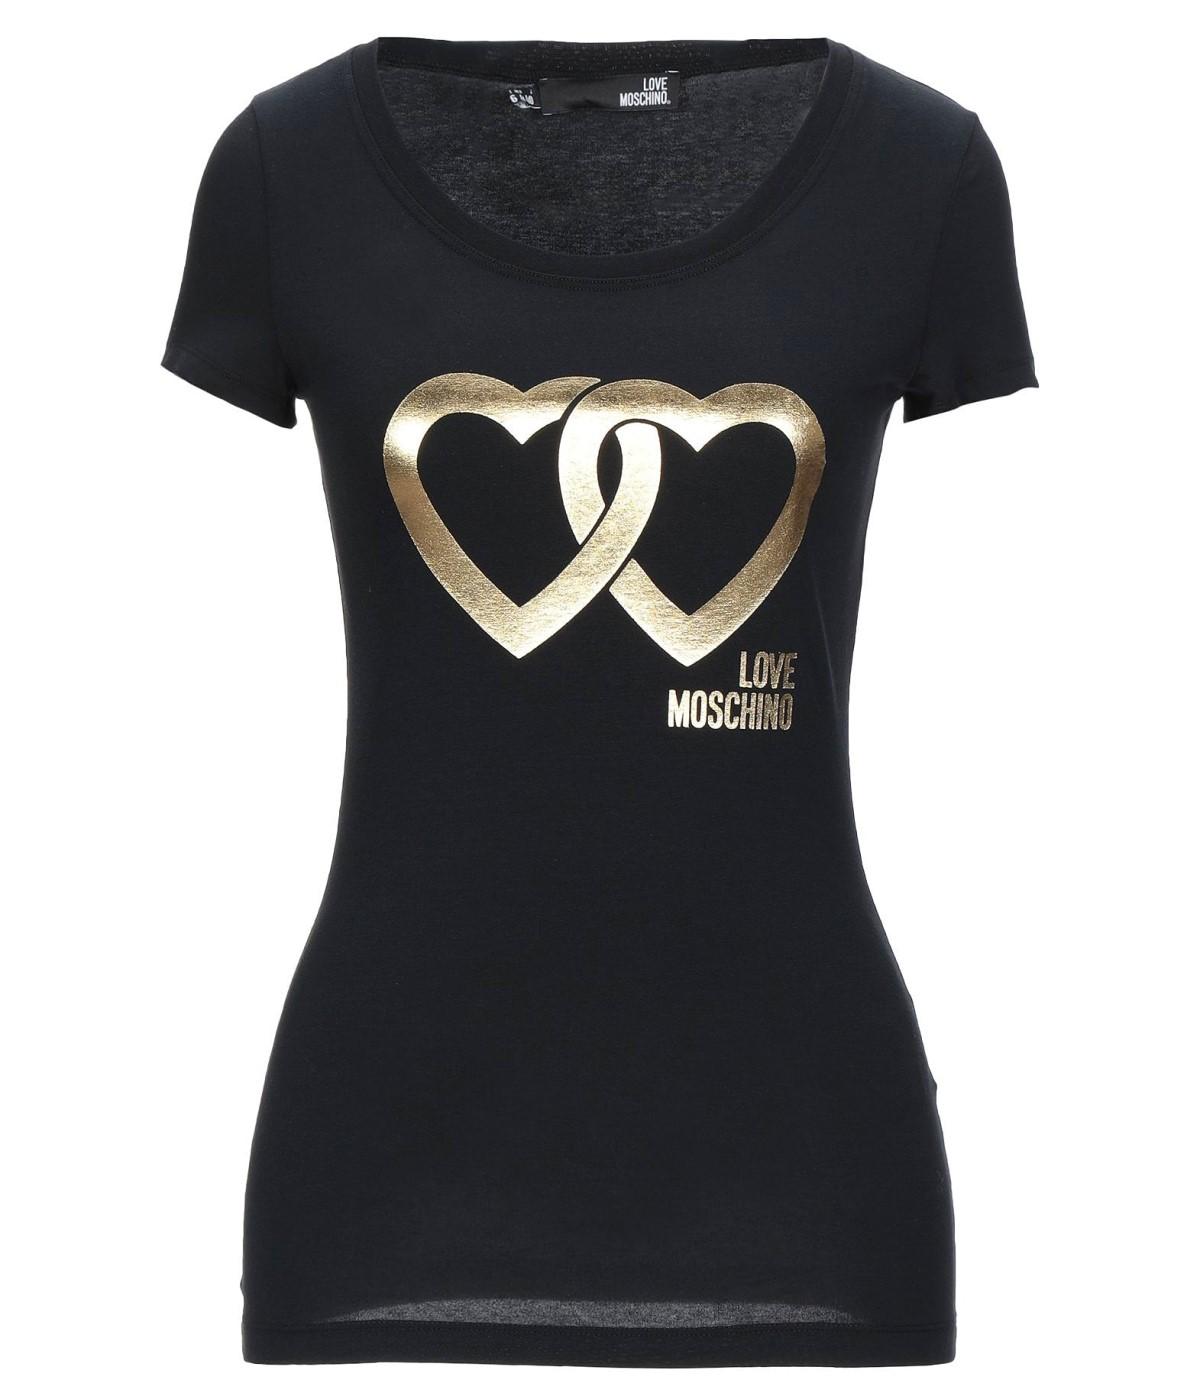 LOVE MOSCHINO T-SHIRT DONNA NERA CUORI GOLD